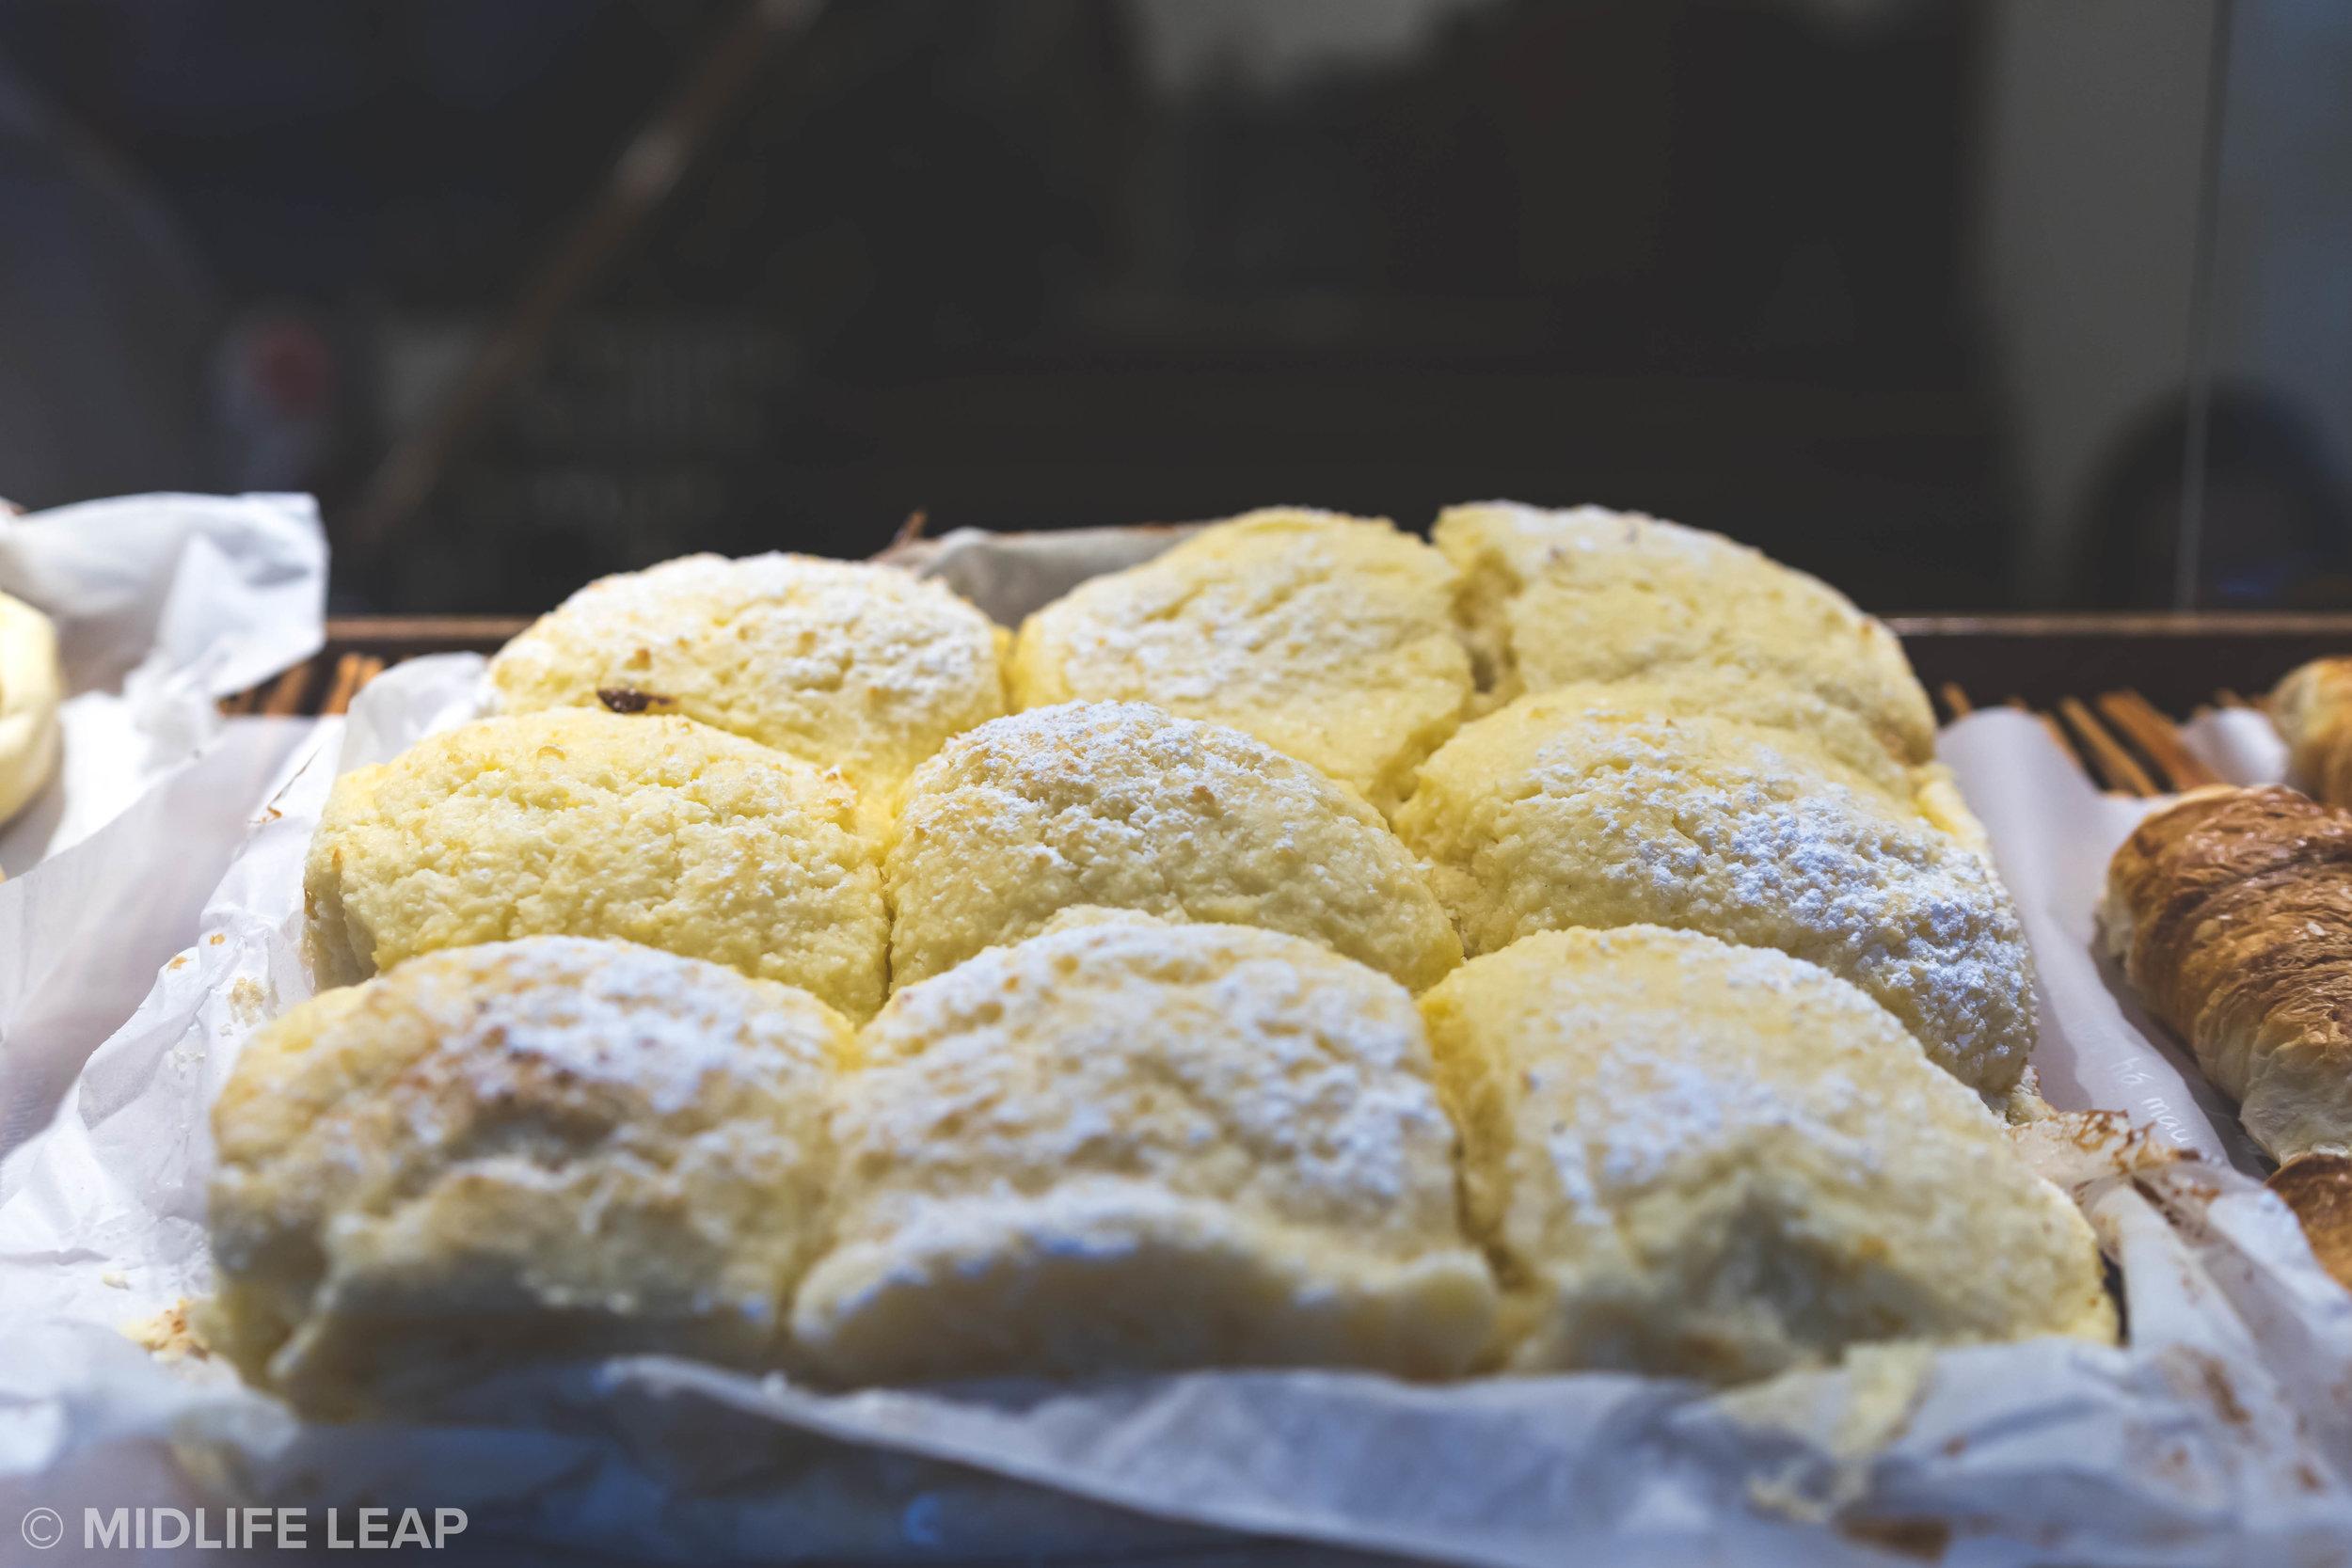 Padaria-Portuguesa-pao-de-deus-best-pastries-in-lisbon